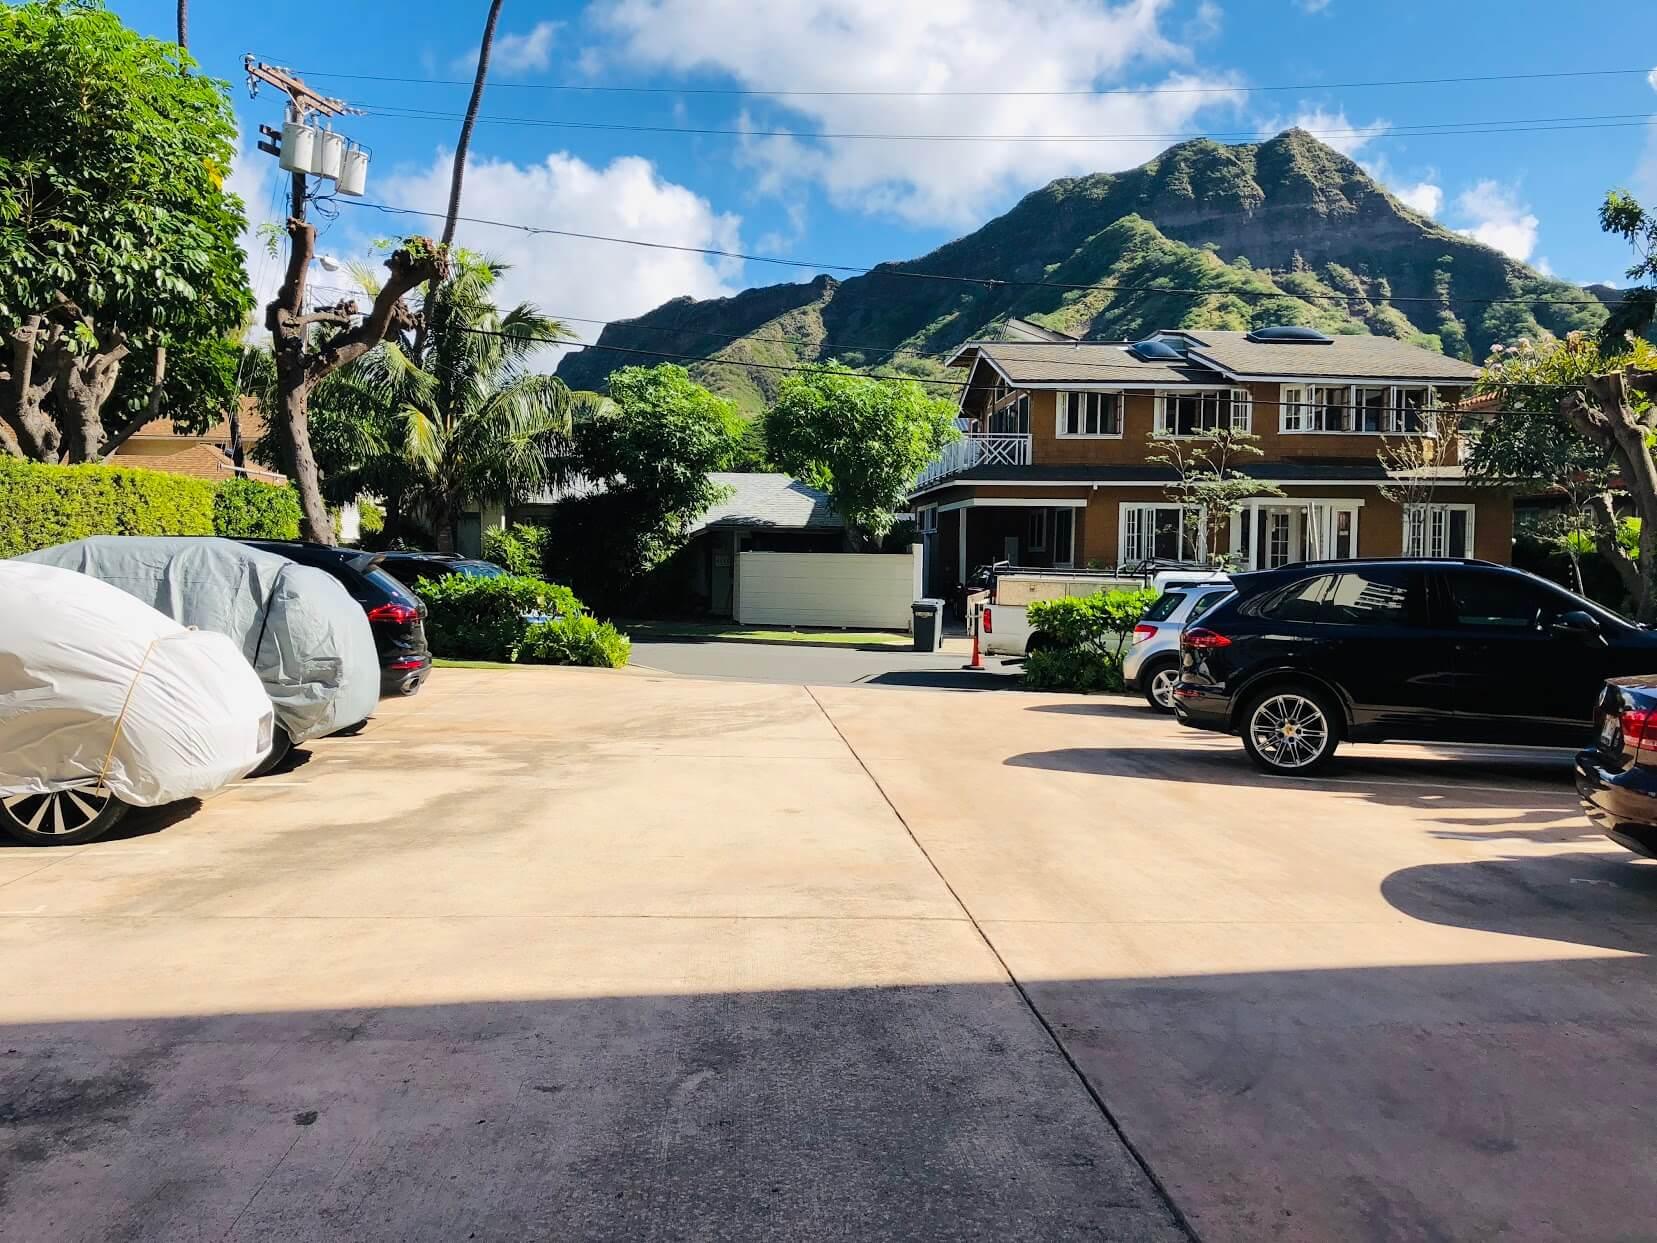 Oceanside Manorの駐車場